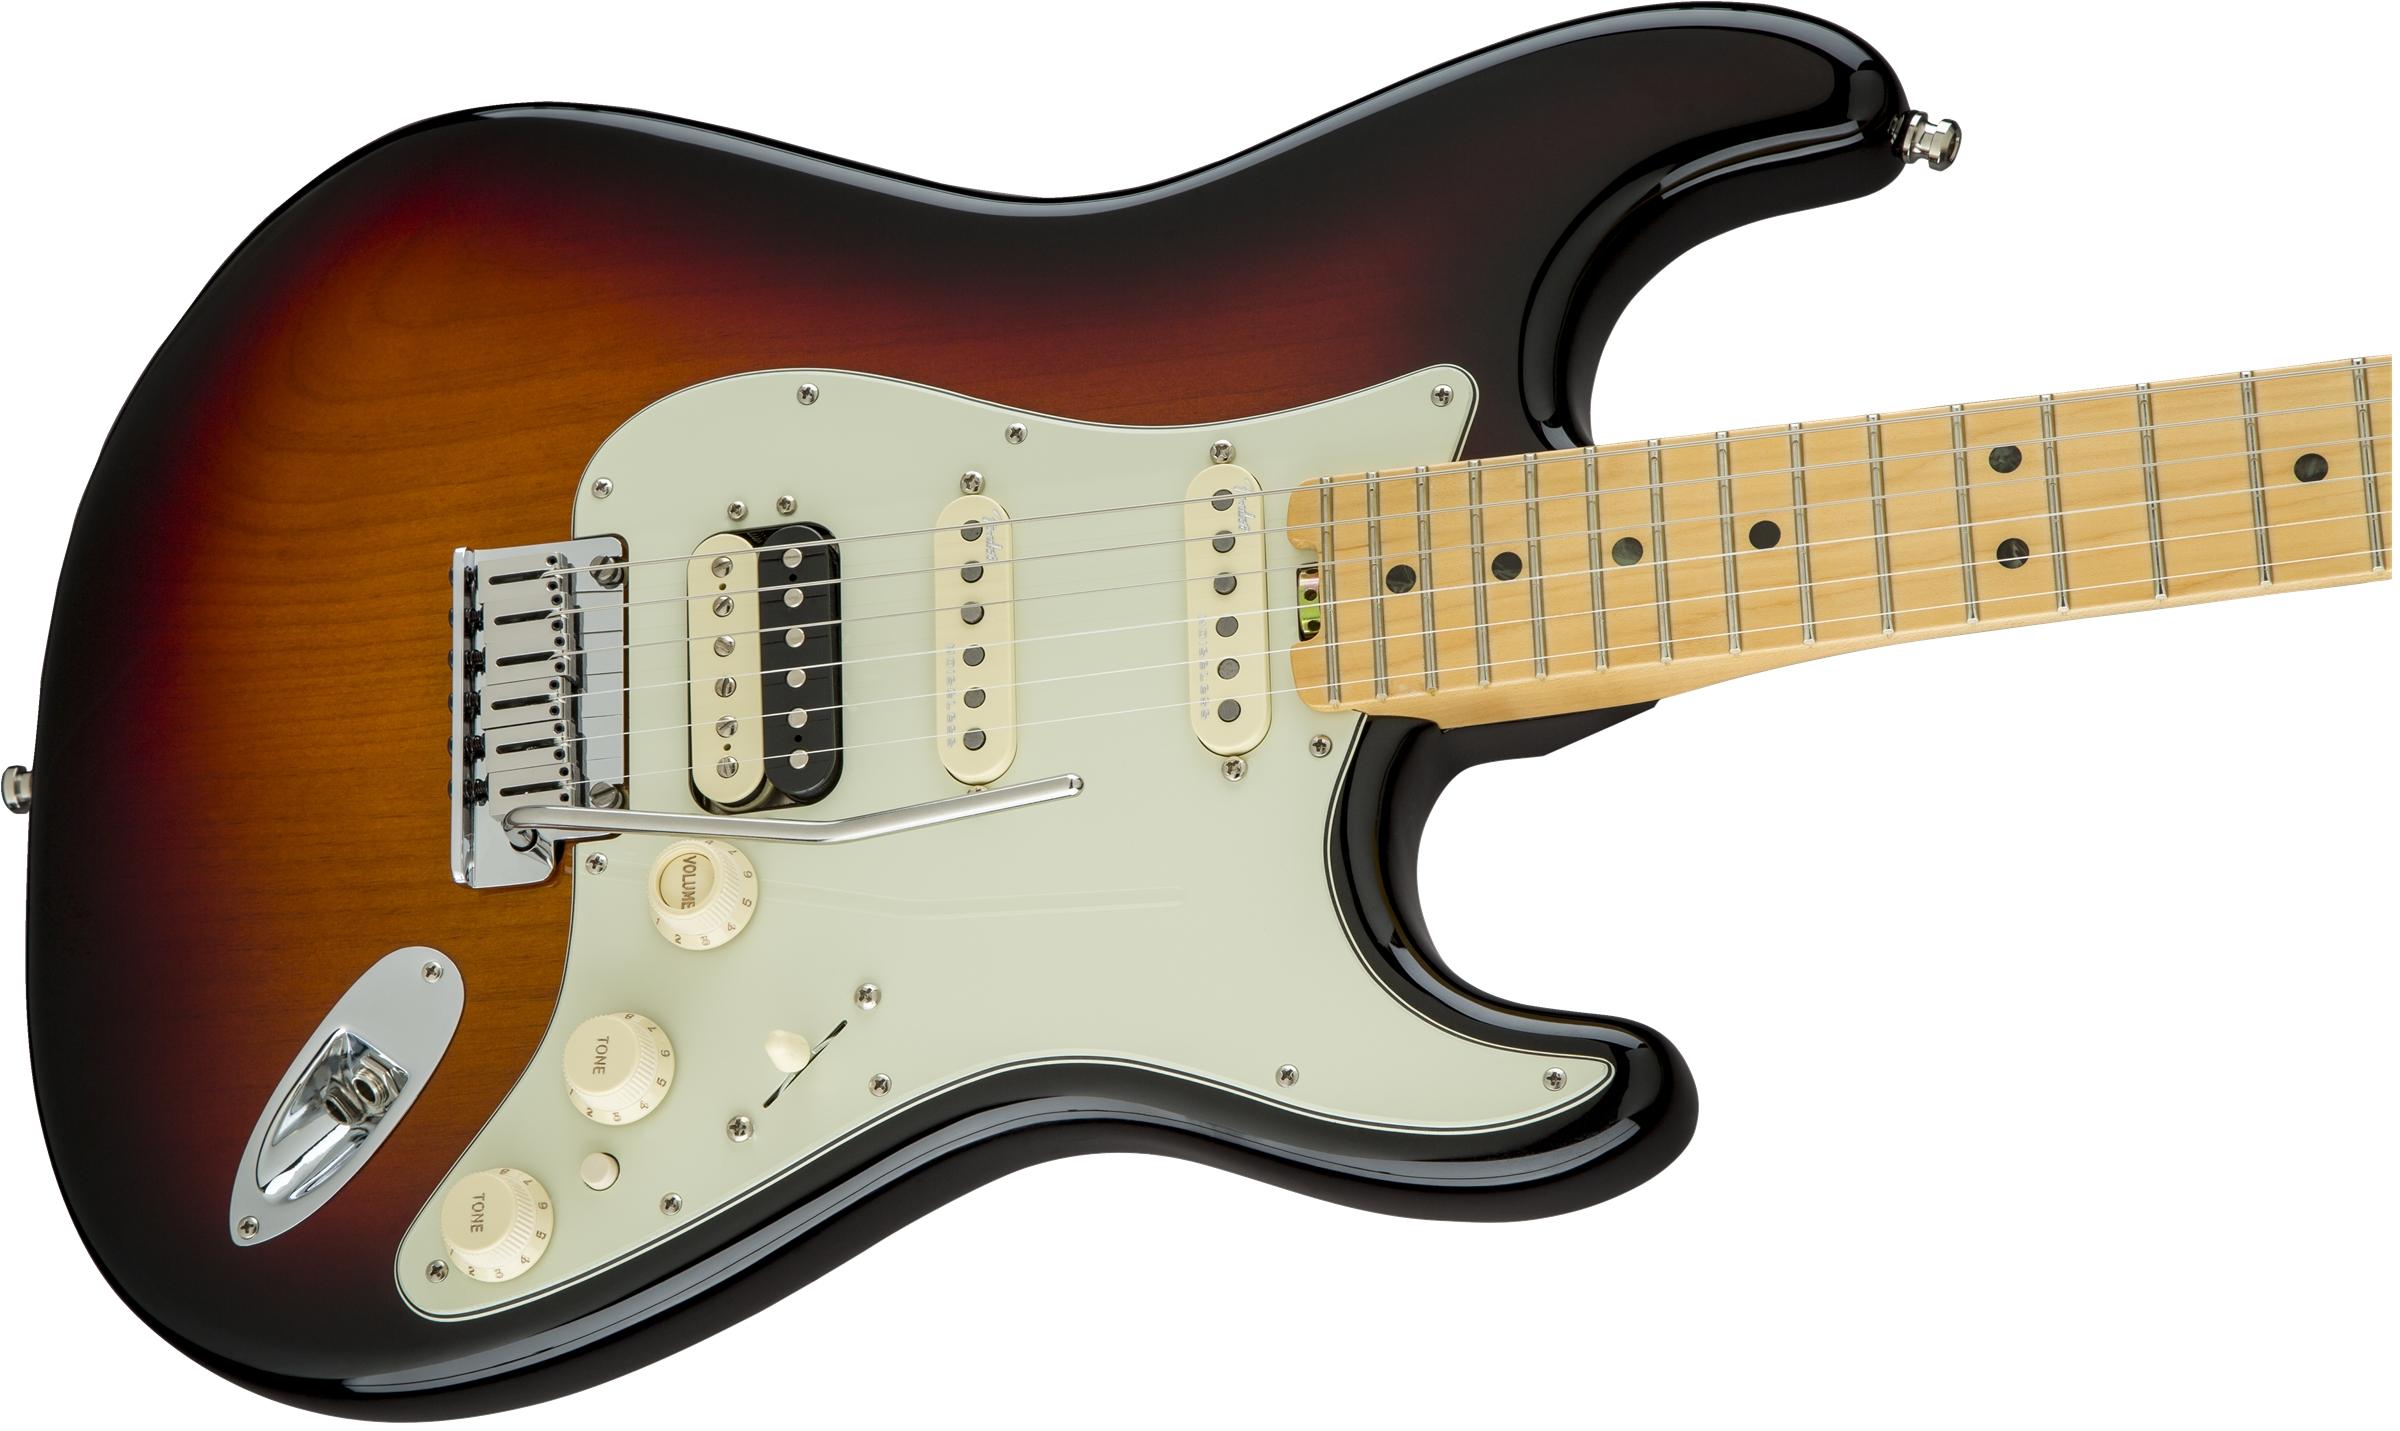 Fender American Elite Stratocaster® HSS Shawbucker 3-Color Sunburst Maple Fingerboard Electric Guitar